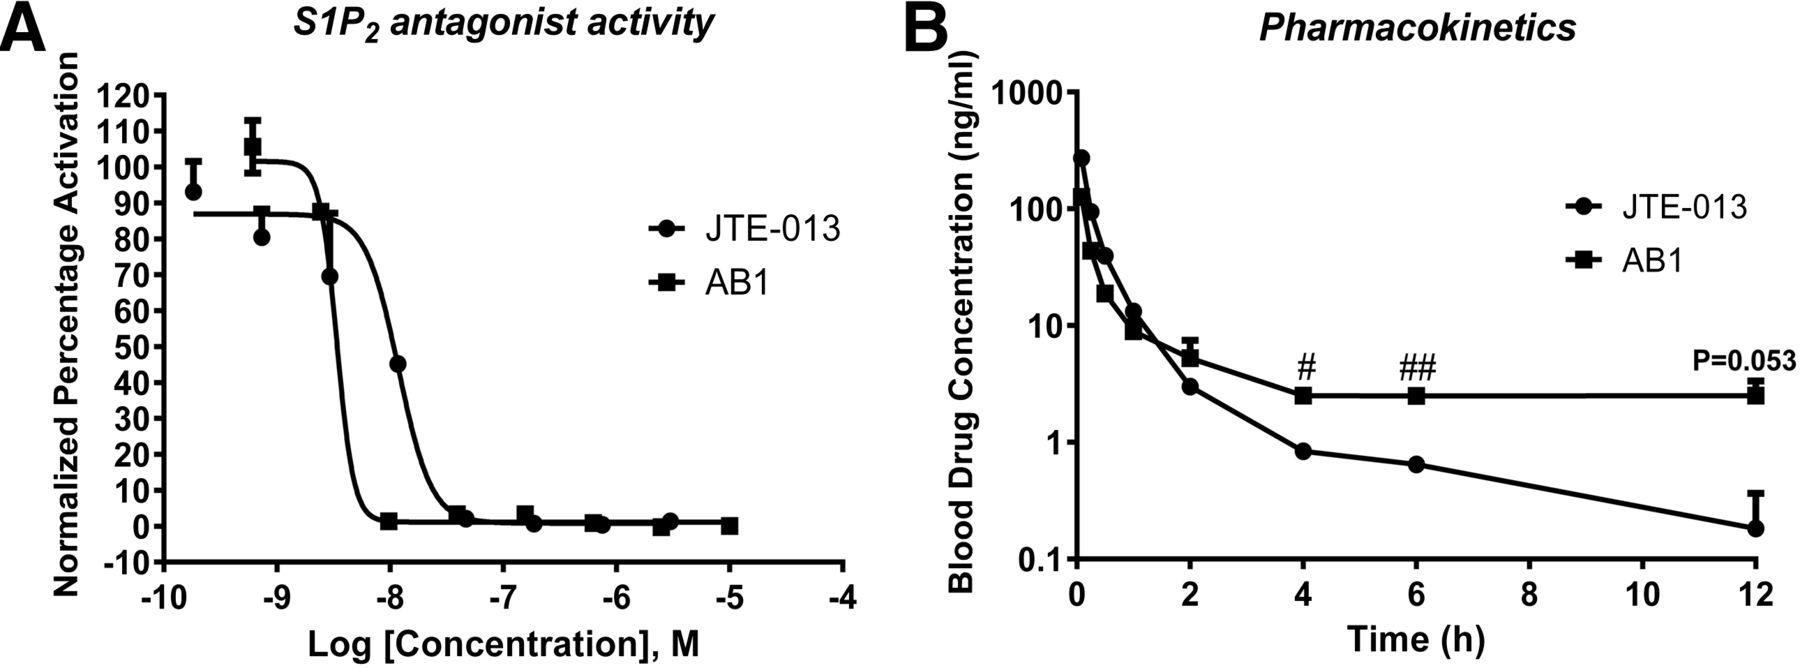 Antitumor Activity of a Novel Sphingosine-1-Phosphate 2